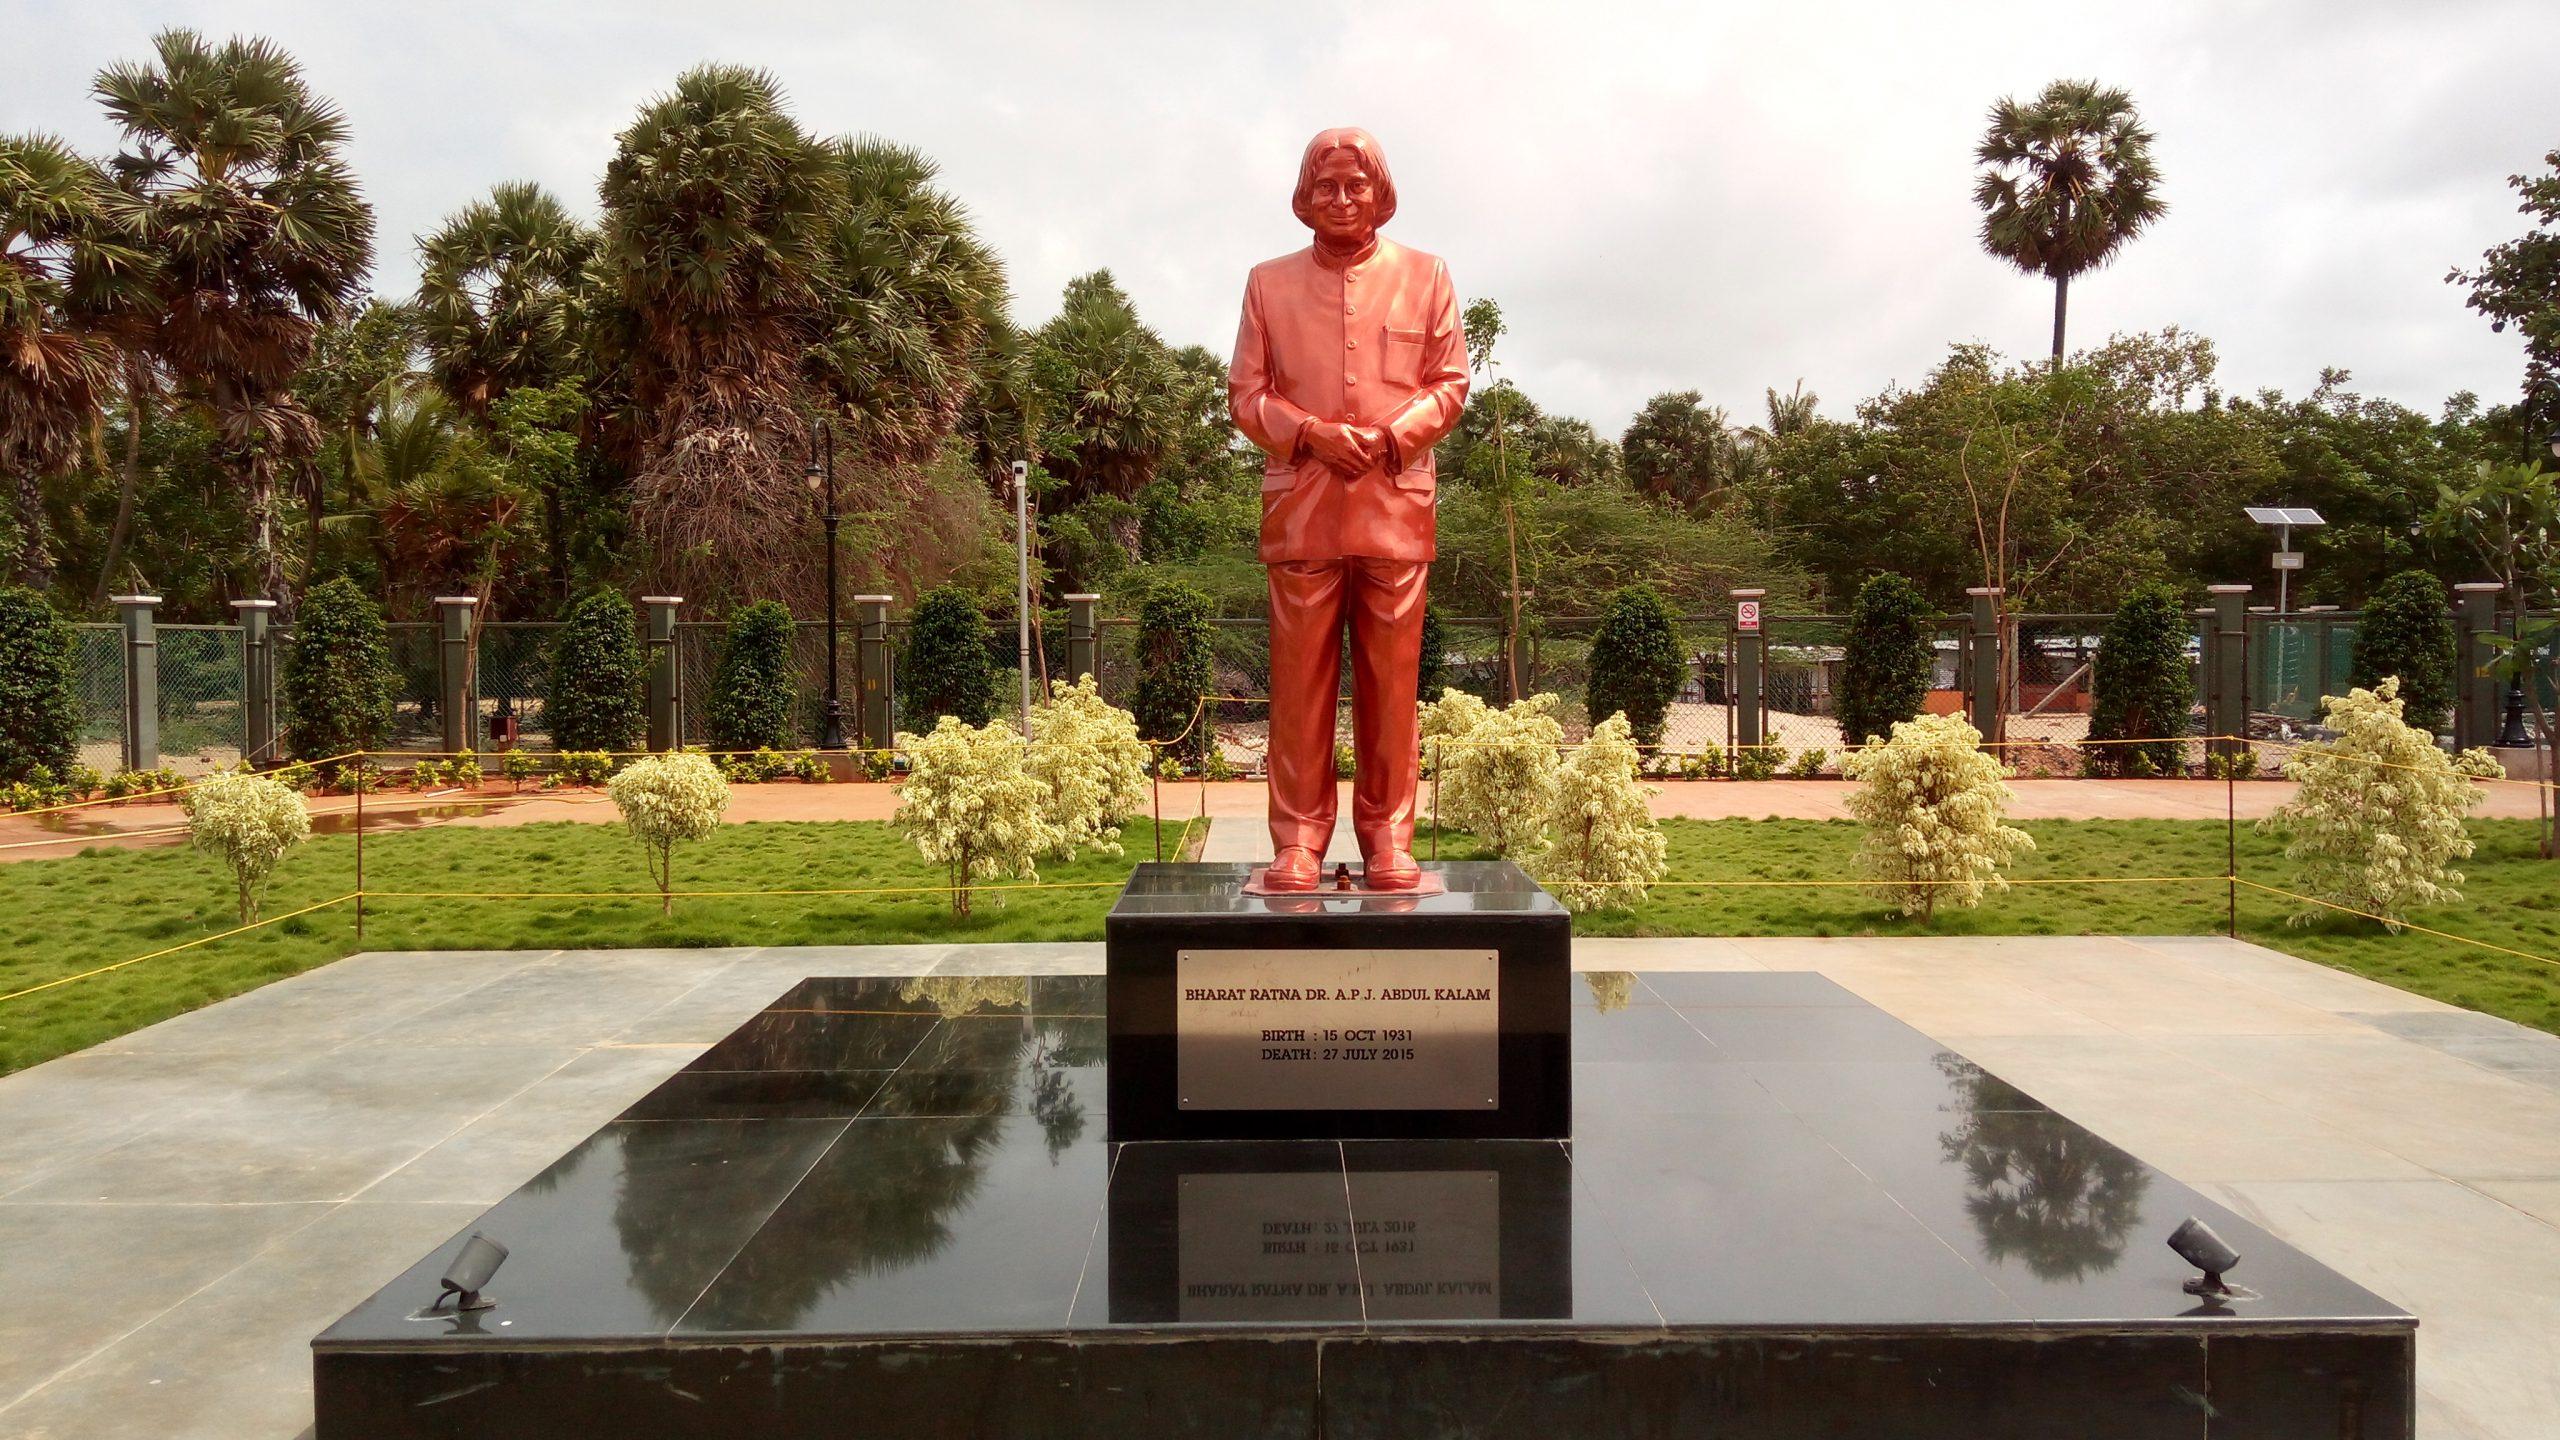 Dr. Abdul Kalam Sir Monument